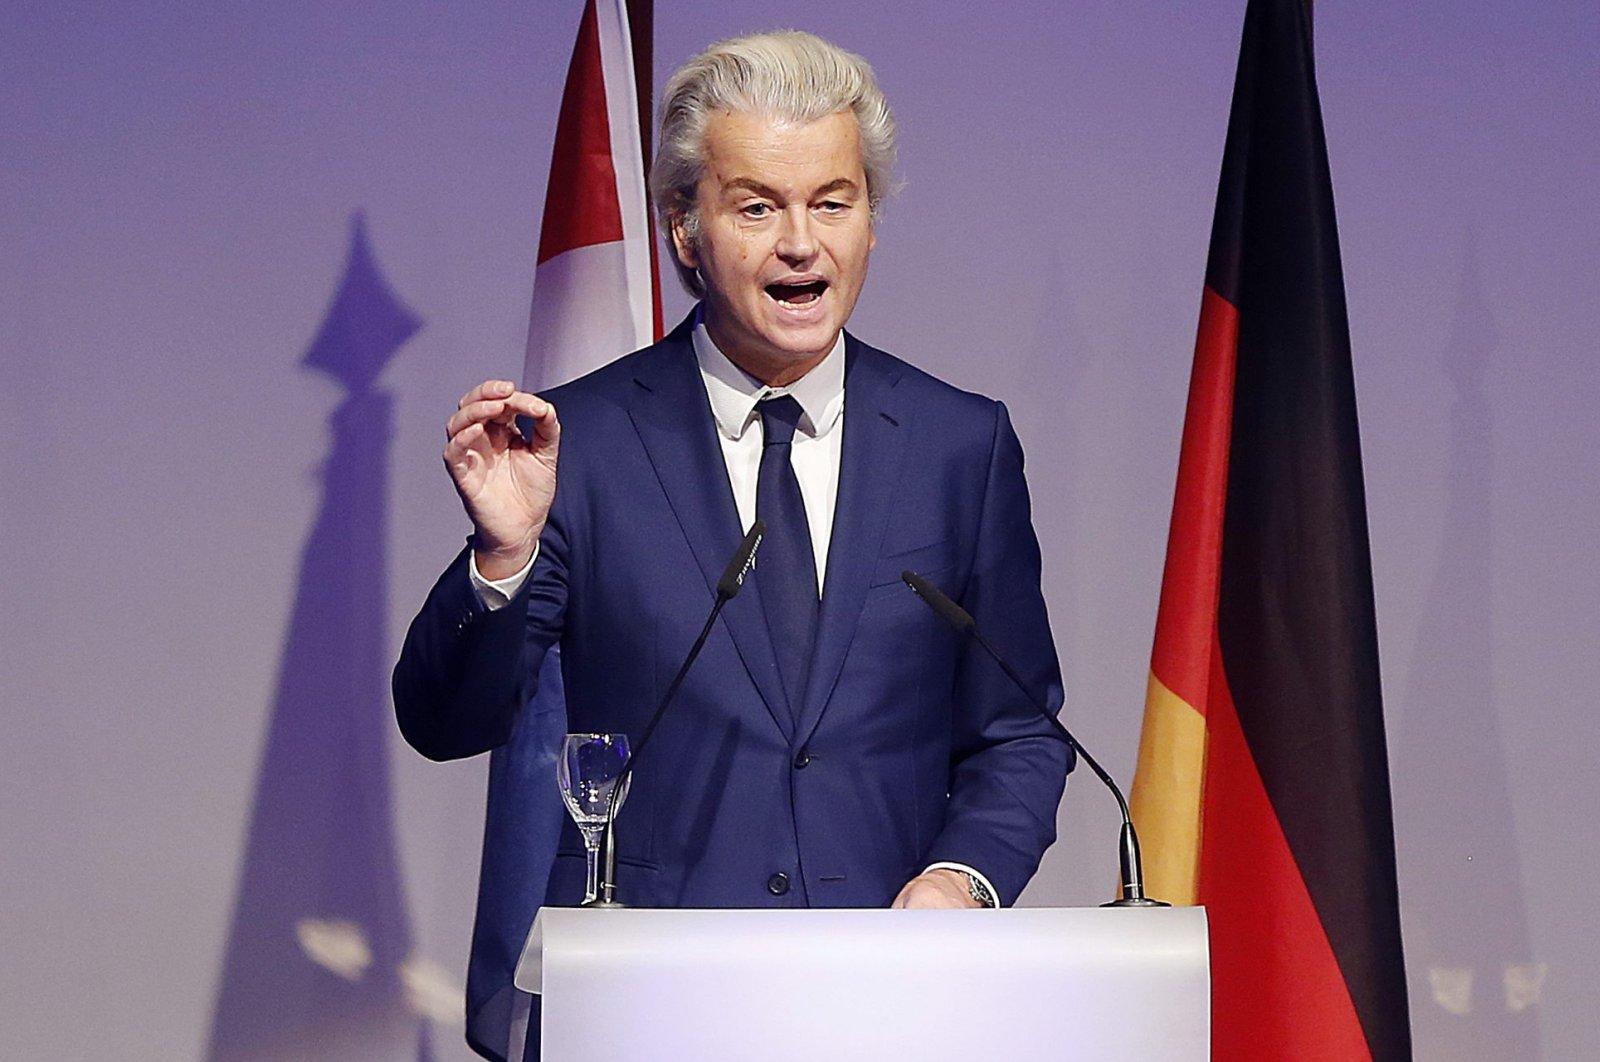 Dutch populist, anti-Islam lawmaker Geert Wilders delivers a speech at a meeting of European Nationalists in Koblenz, Germany, Jan. 21, 2017. (AP File Photo)